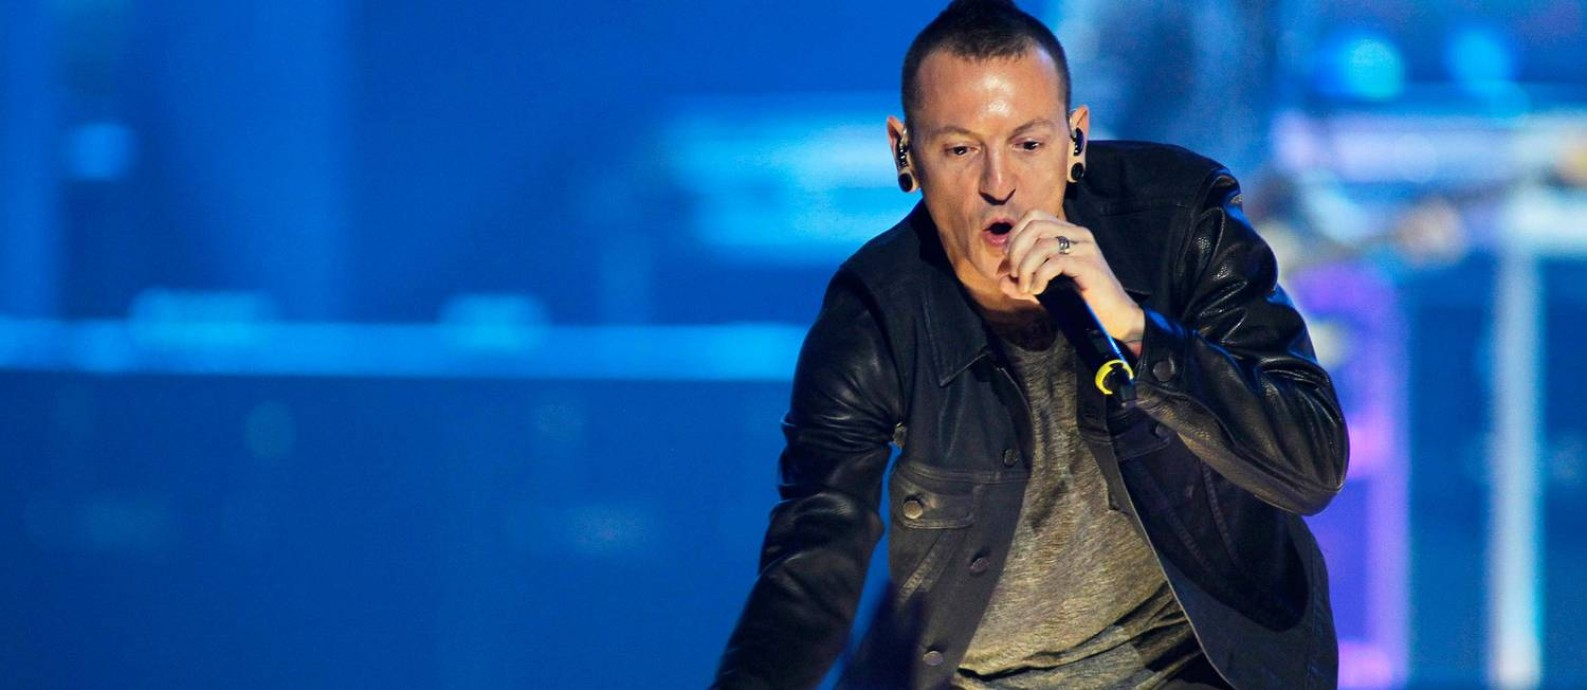 O ex-vocalista do Linkin Park, Chester Bennington Foto: Steve Marcus / REUTERS